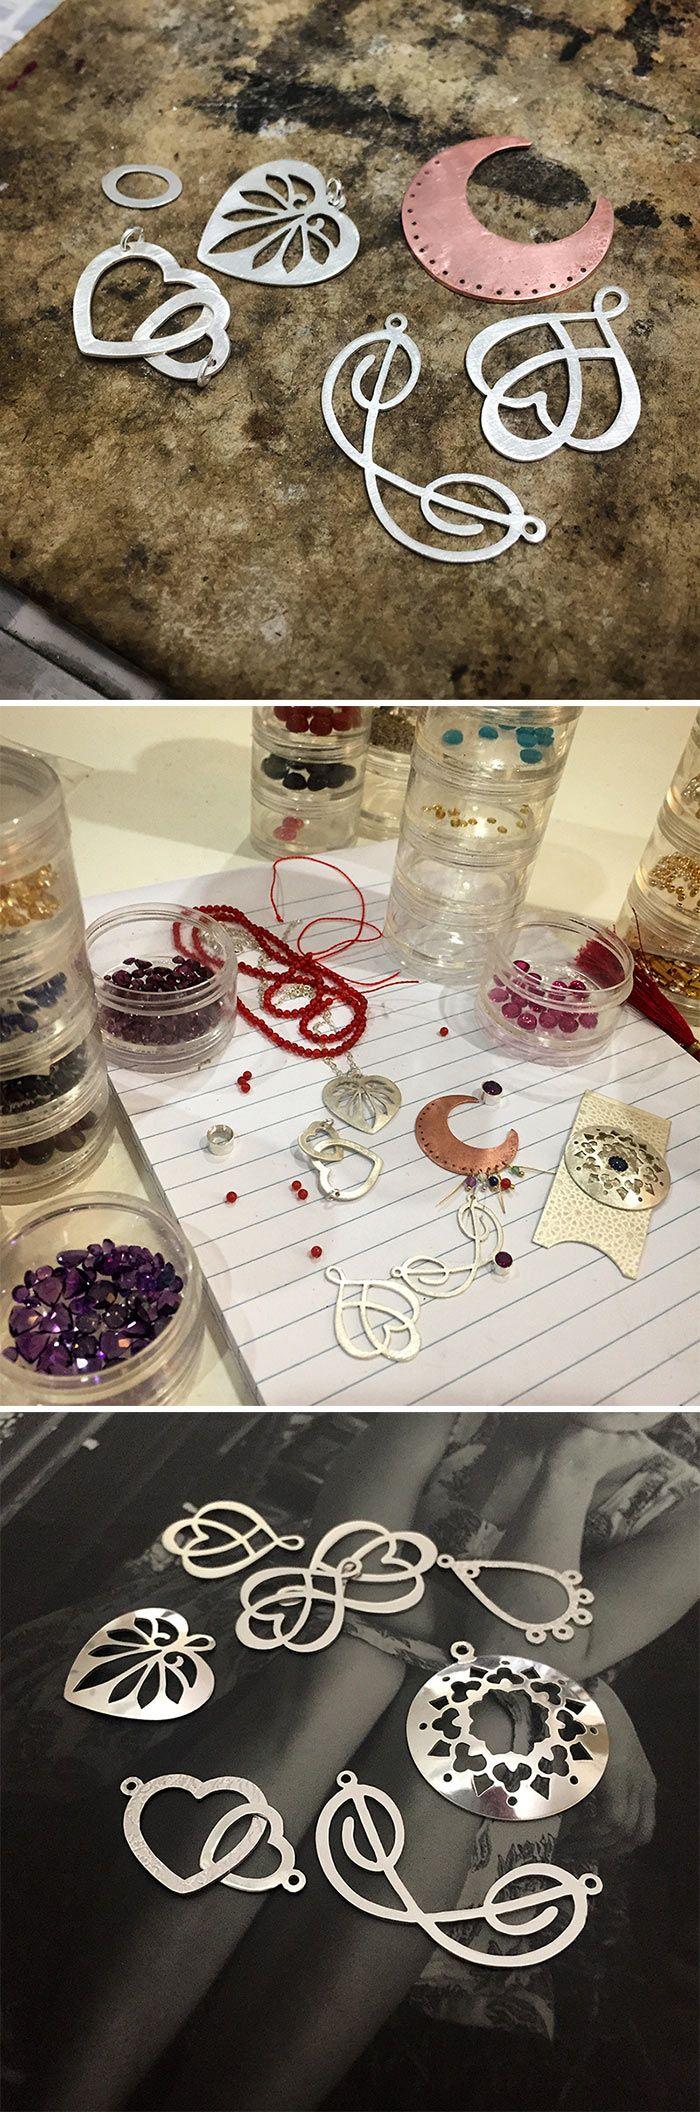 Best 25+ Handmade silver jewelry ideas on Pinterest   Silver ring ...